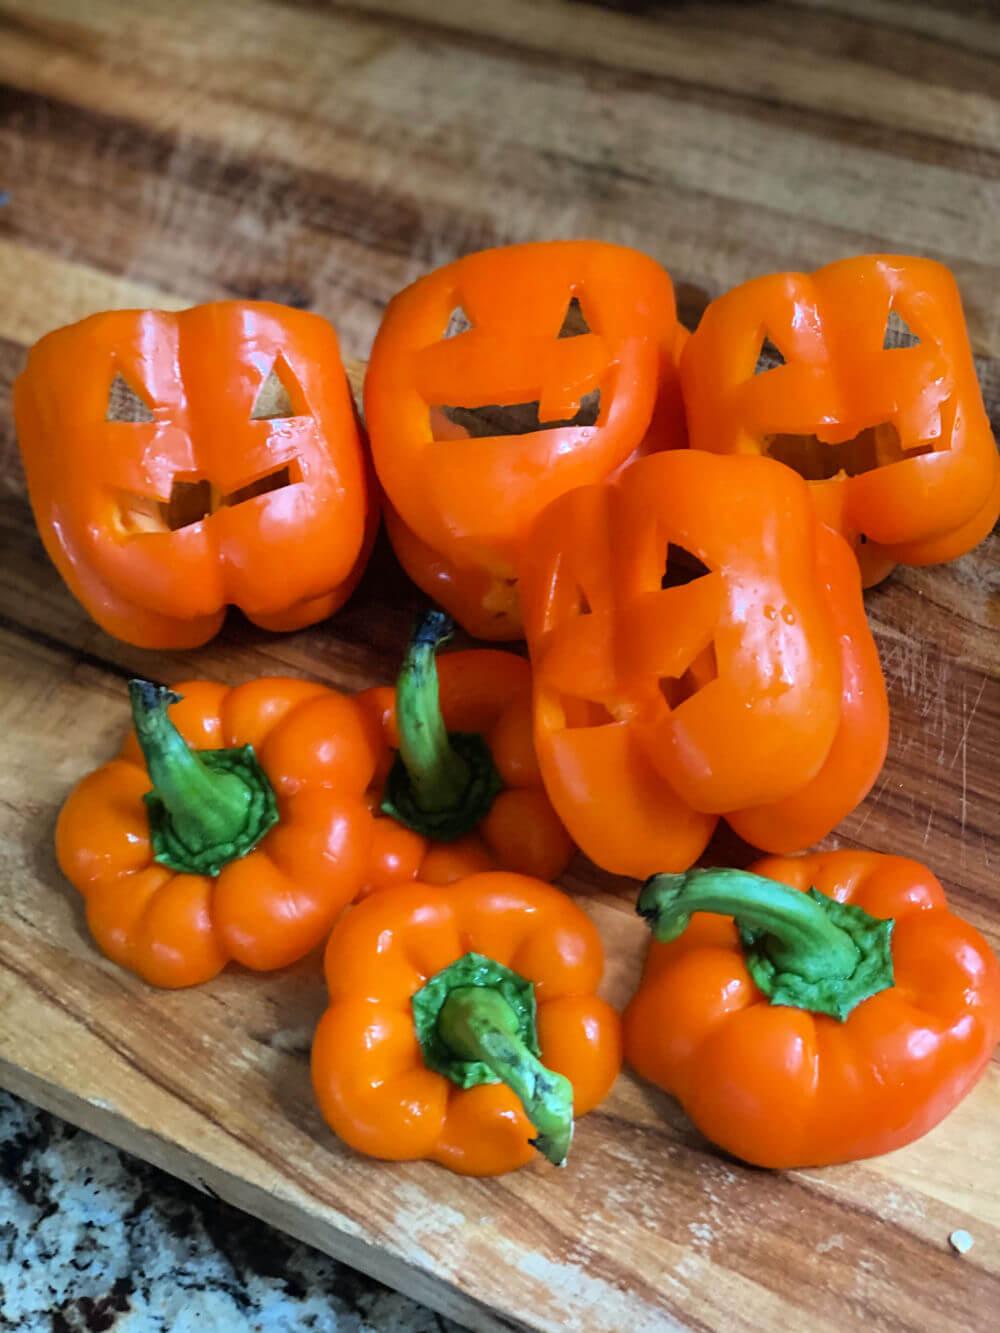 jack o' lantern bell peppers